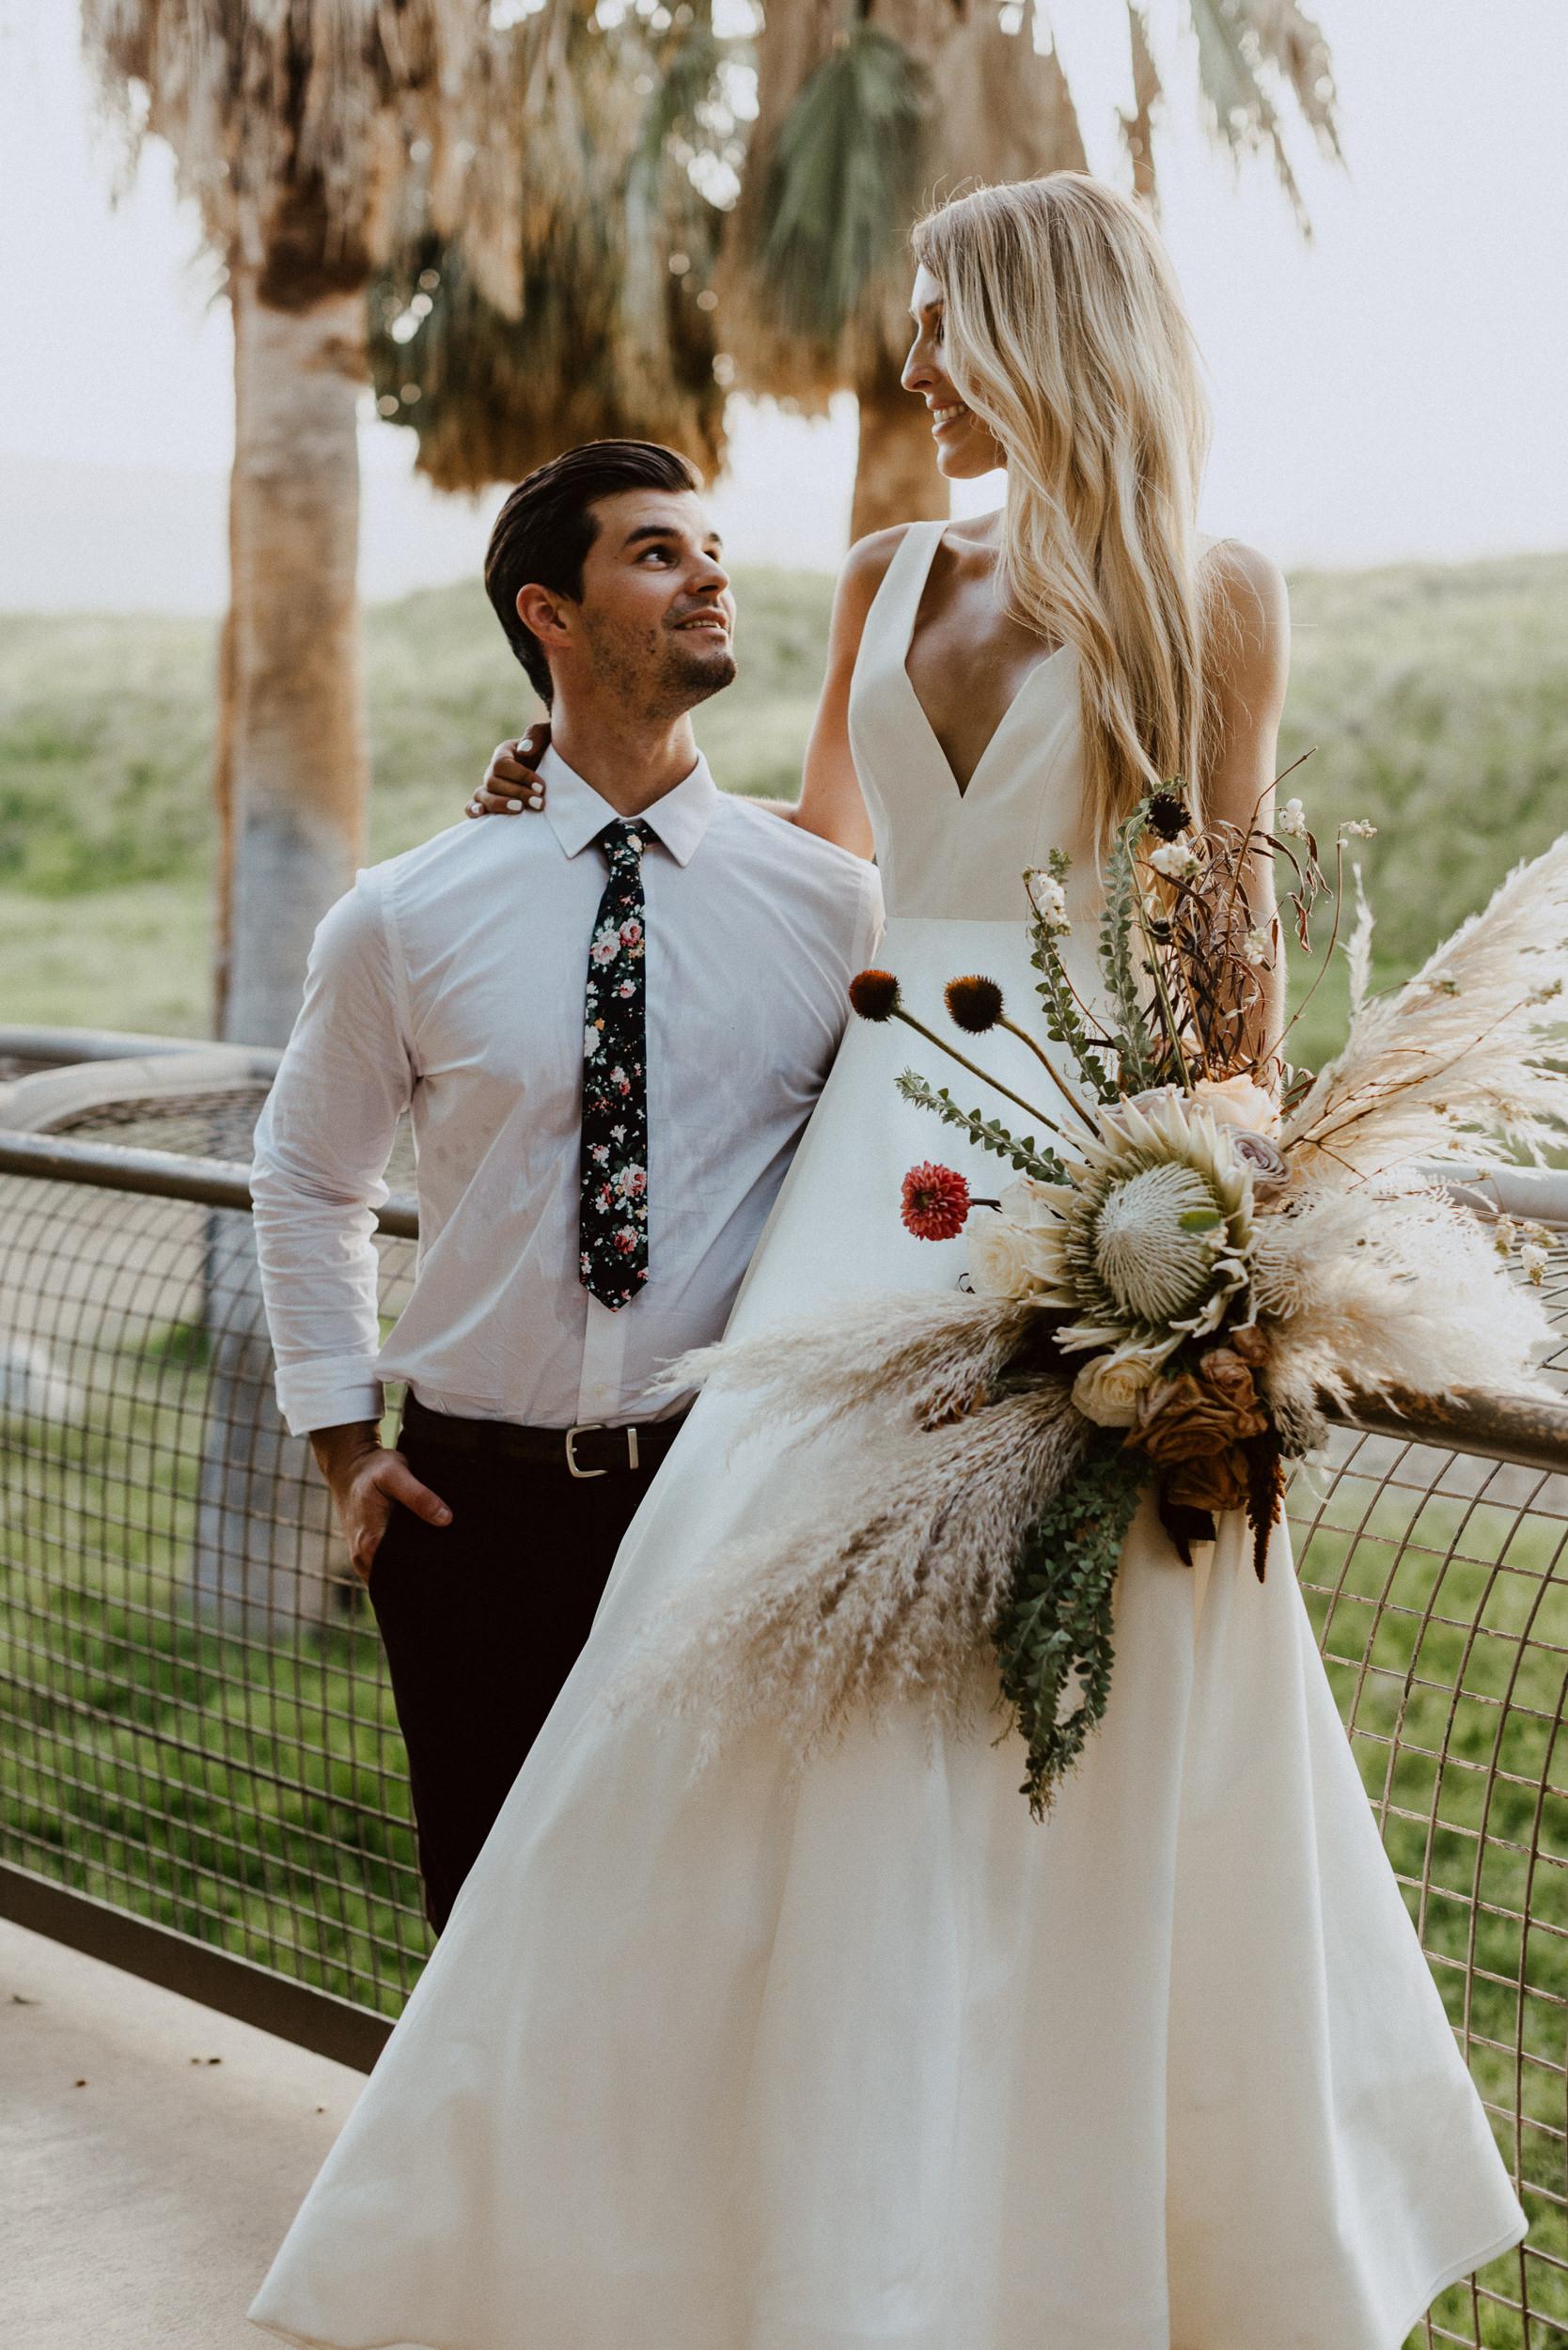 sChelsie + Chris - The Desert Shootout Wedding Romantics at The Living Desert-170.jpg